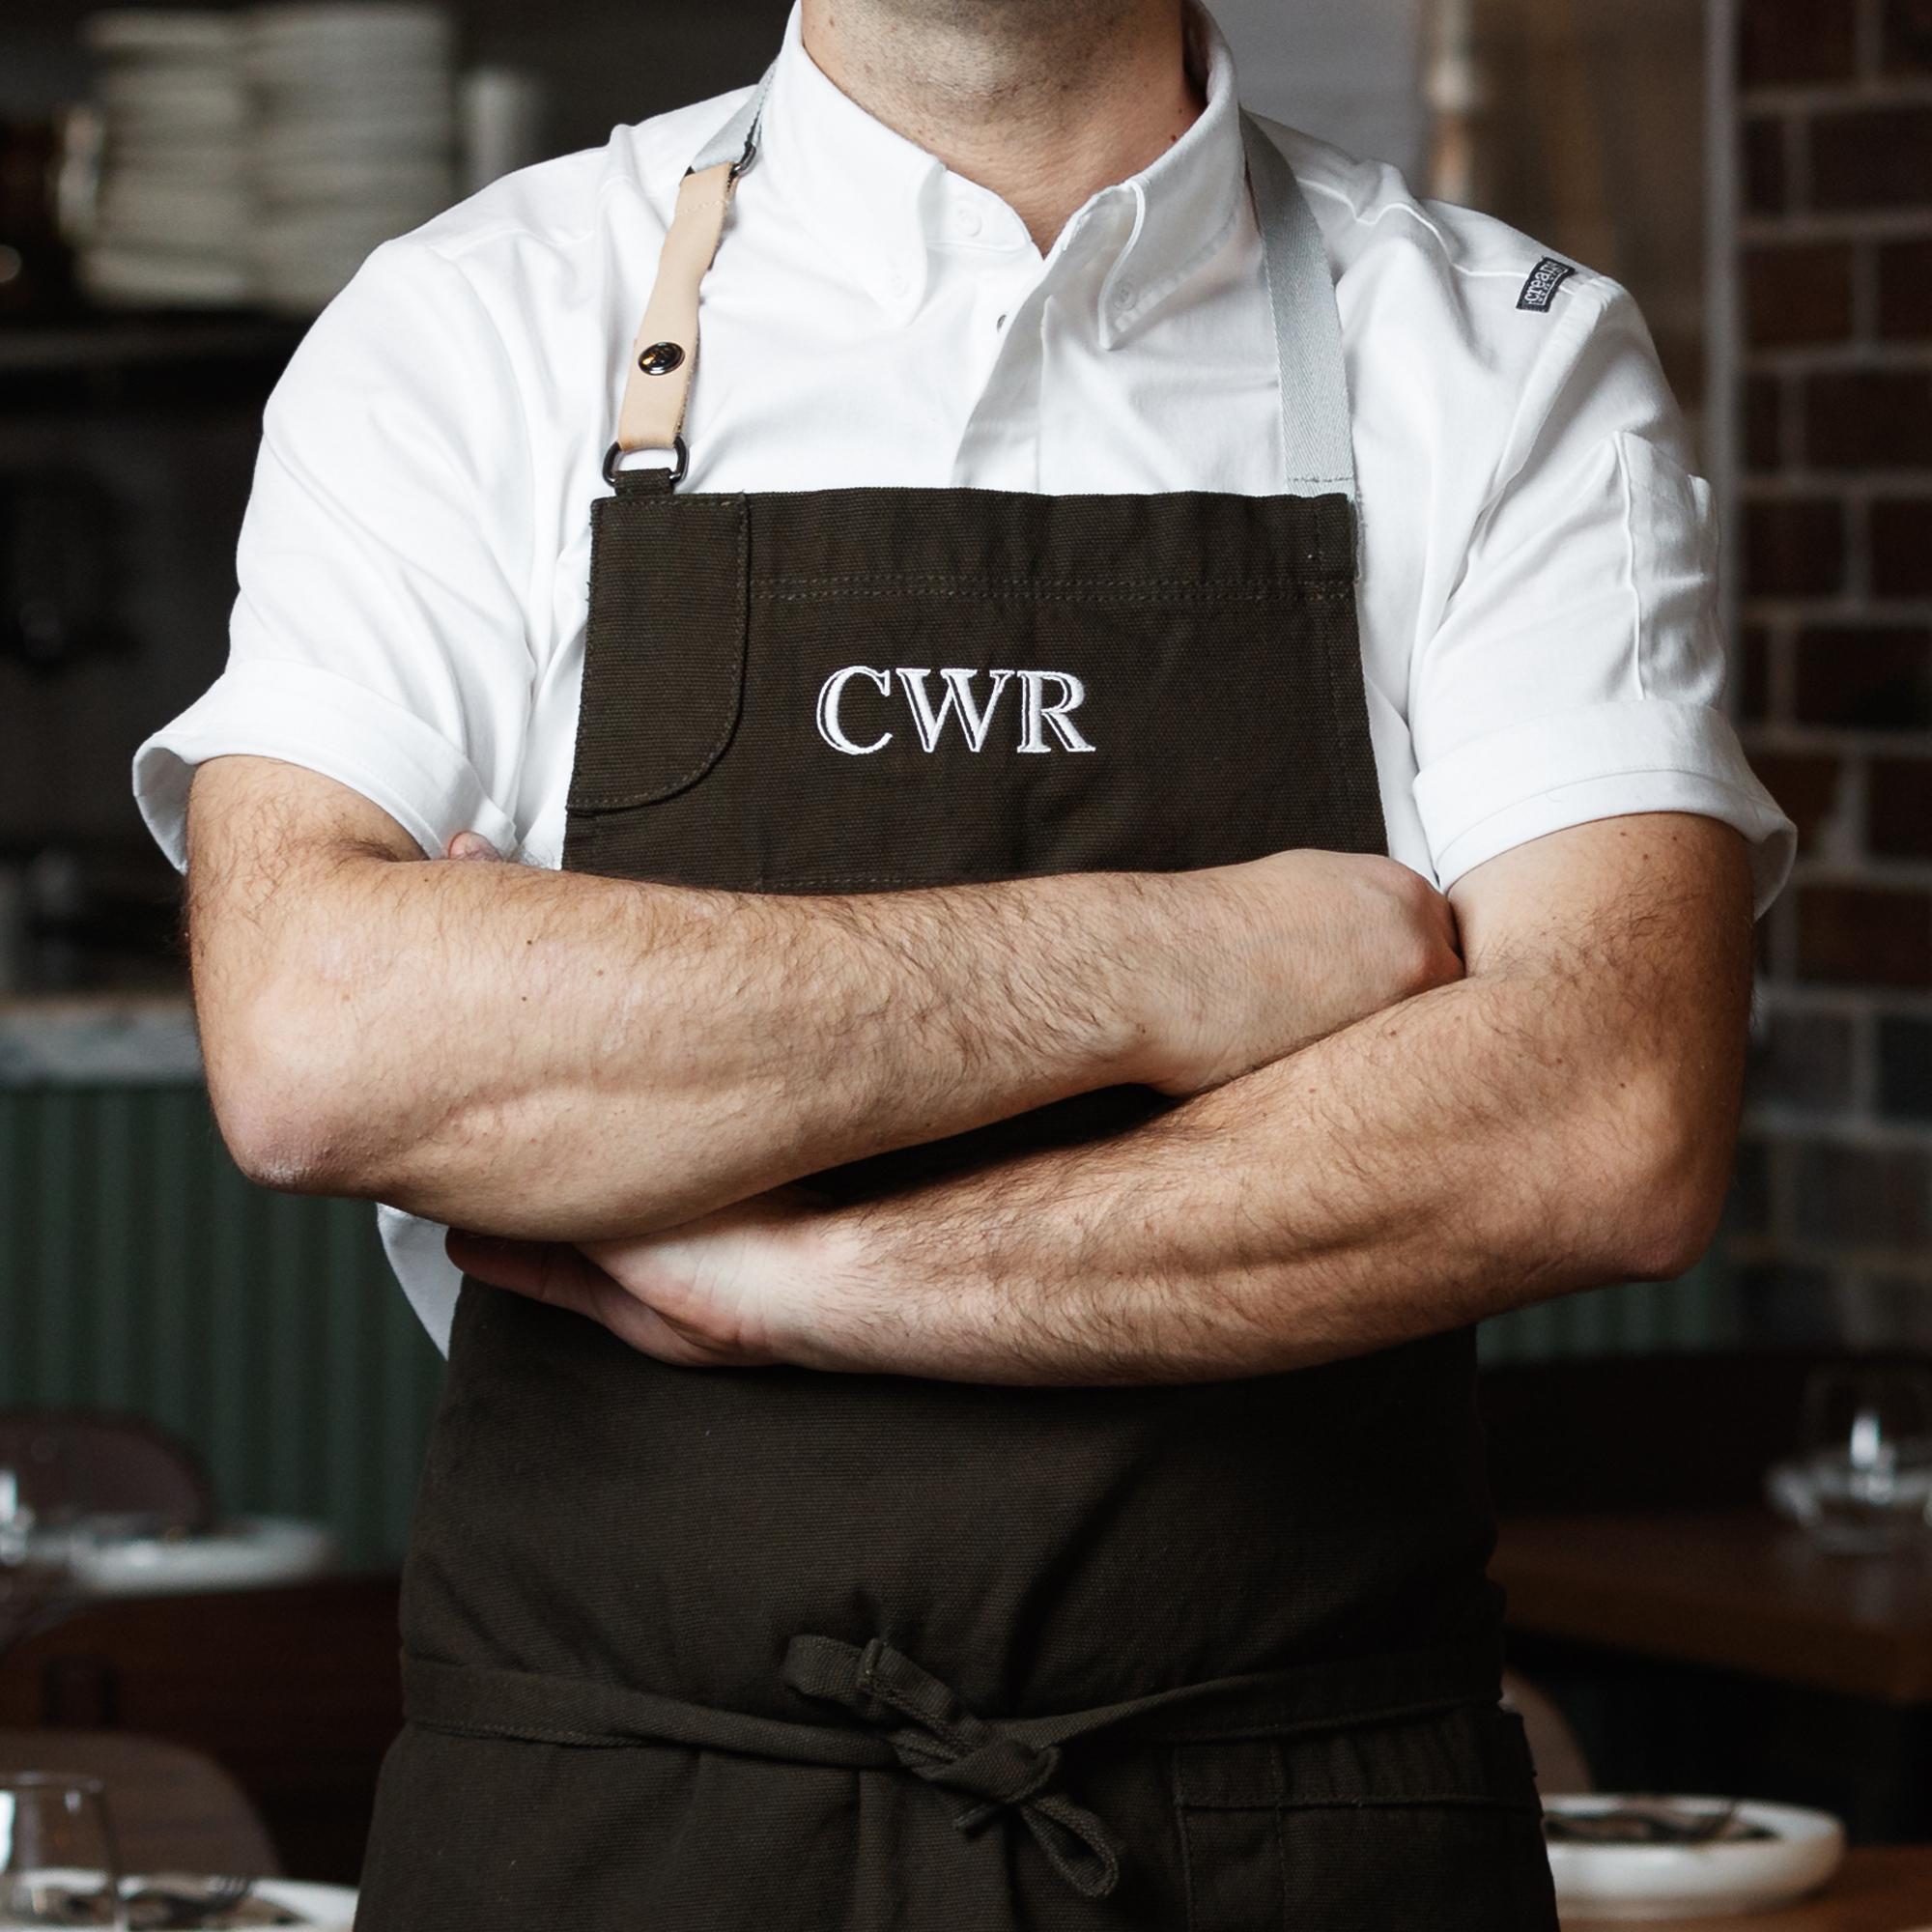 sydney design social coogee wine room logo branding uniform apron chef